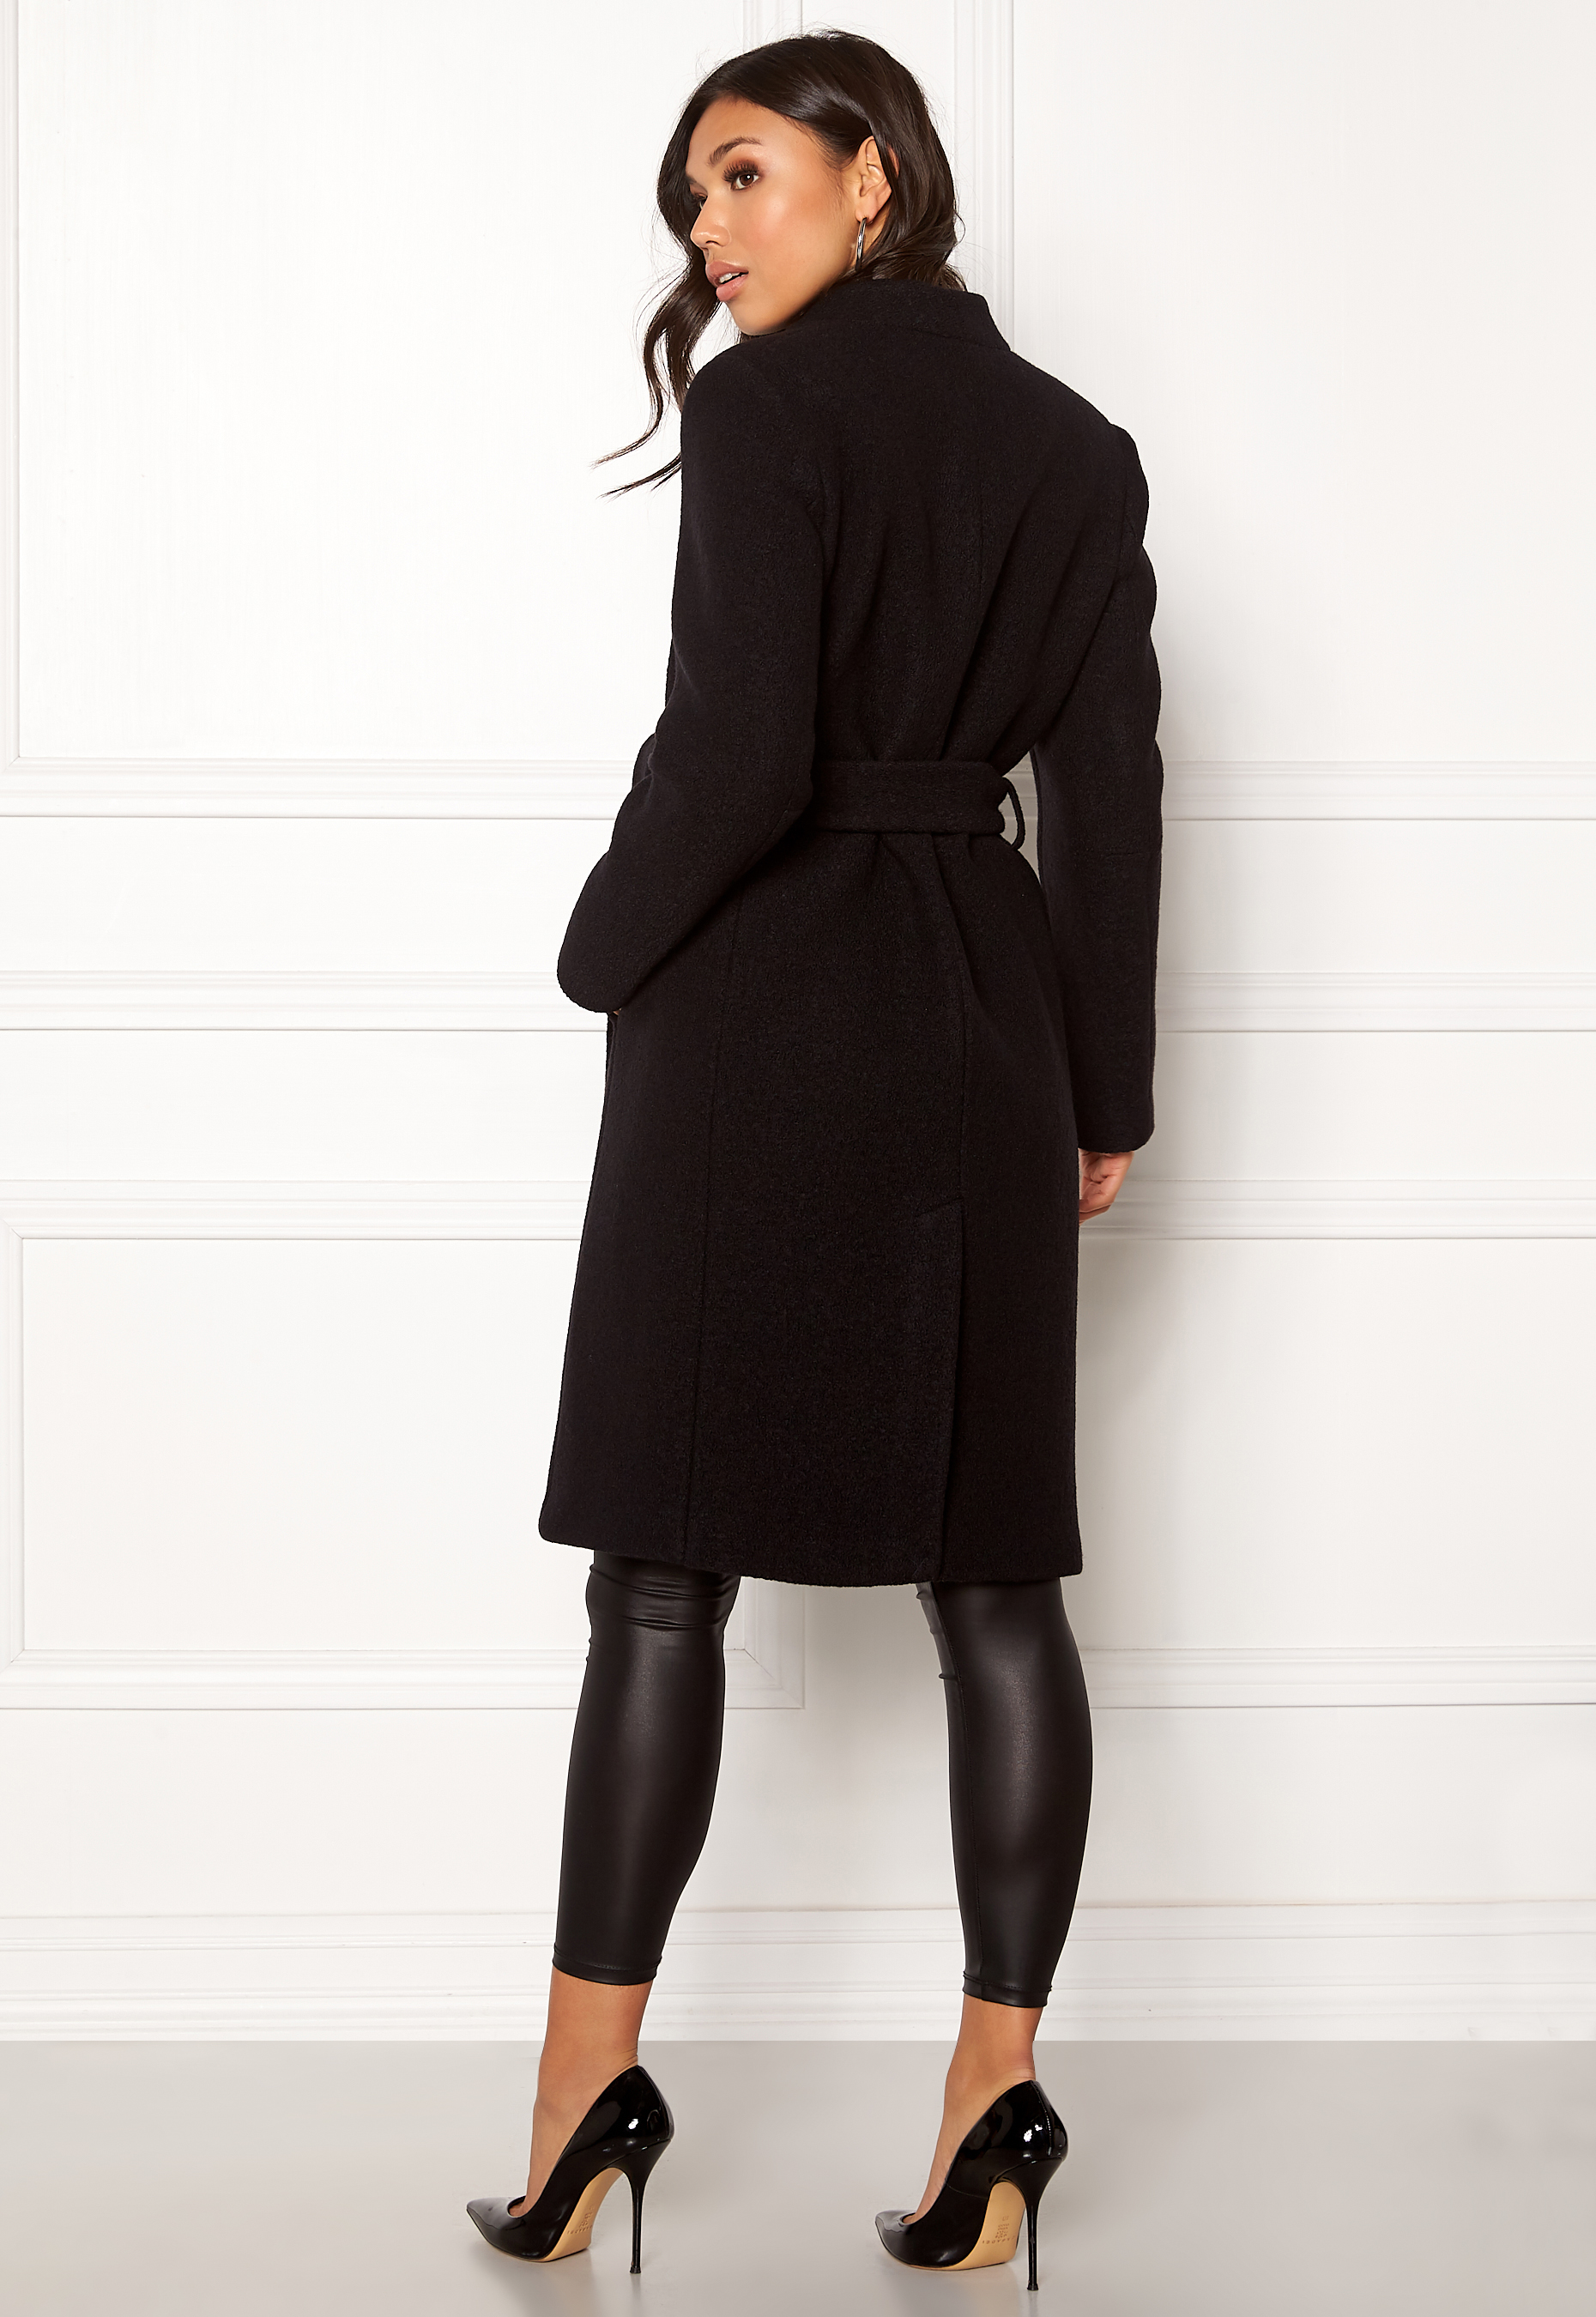 dfb5abea TIGER OF SWEDEN Lovelle Jacket Midnight Black - Bubbleroom